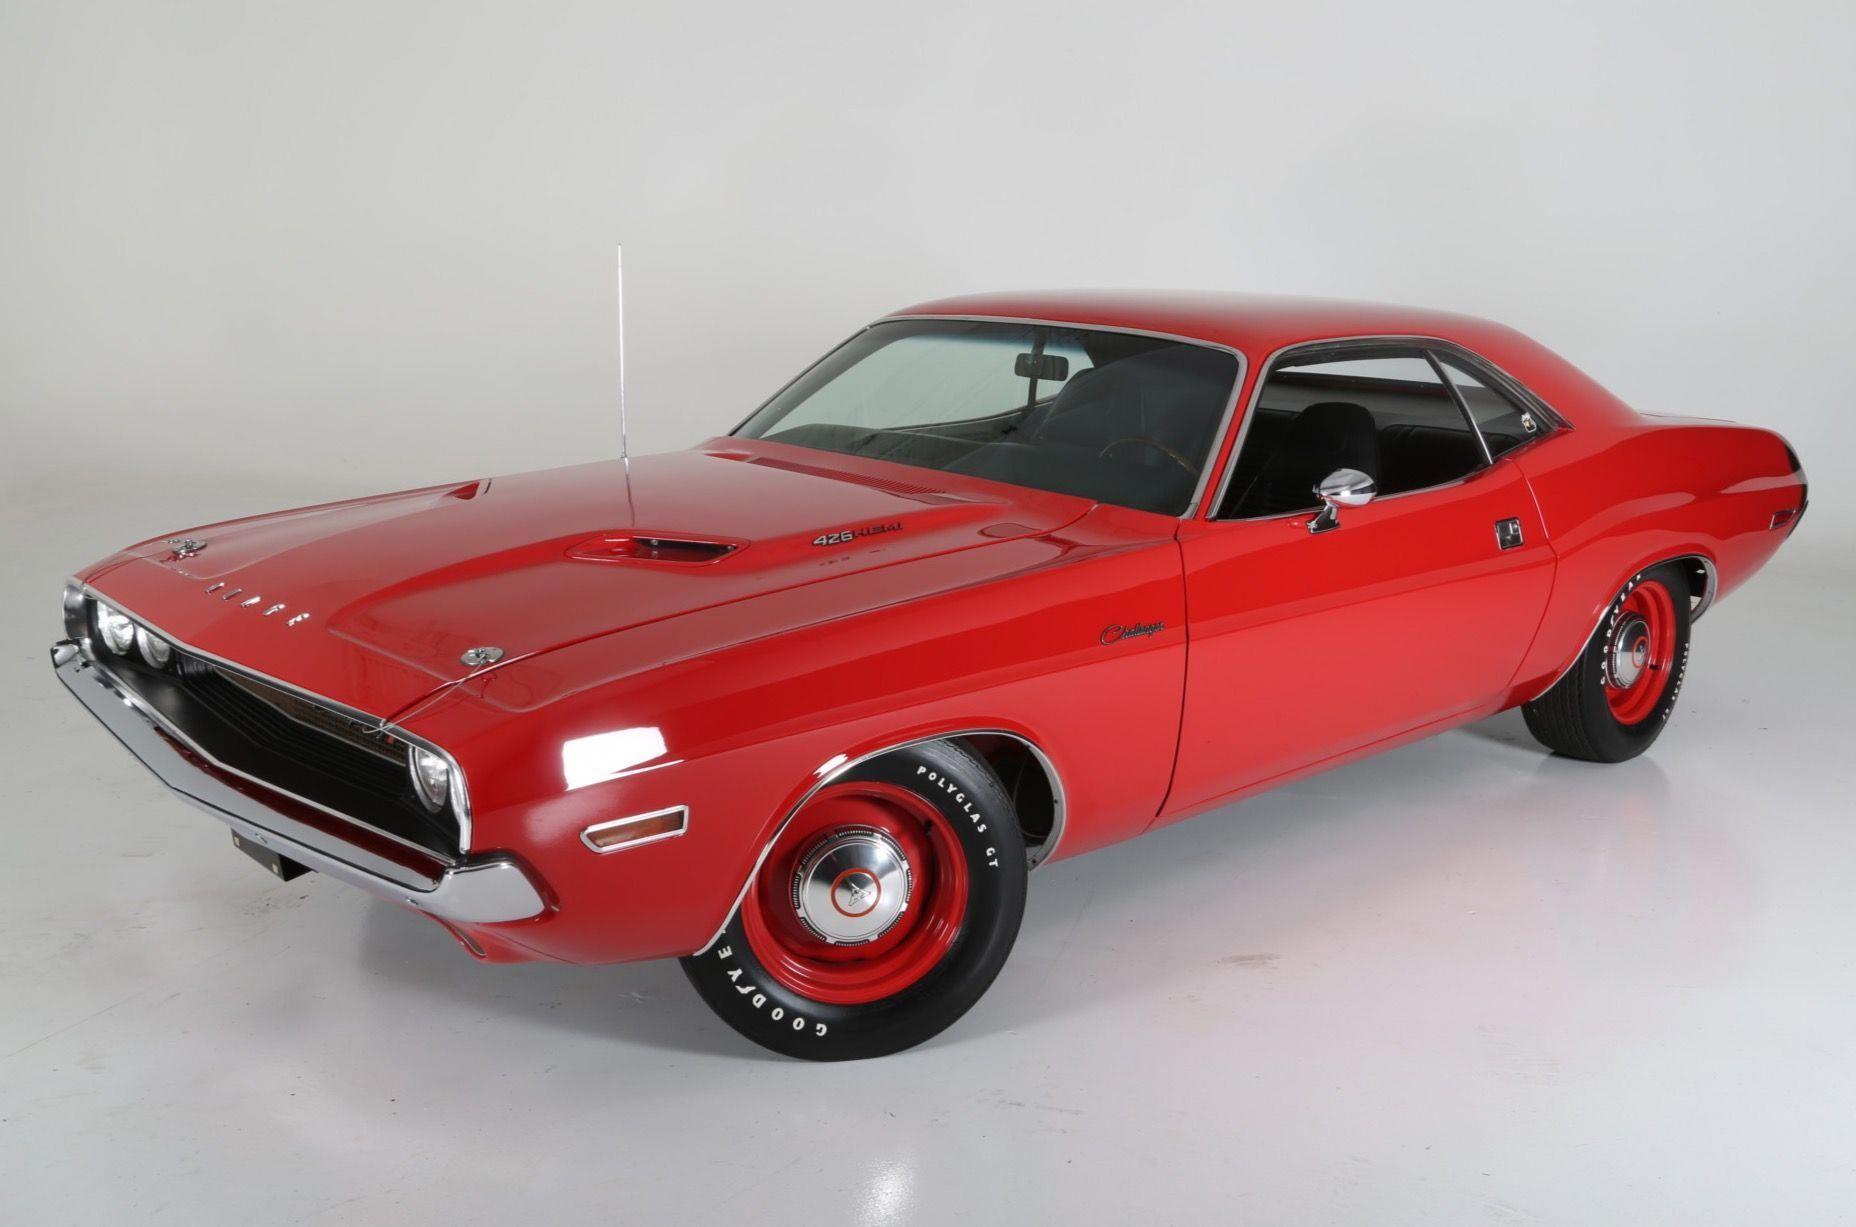 20+ Dodge challenger rt 1970 ideas in 2021